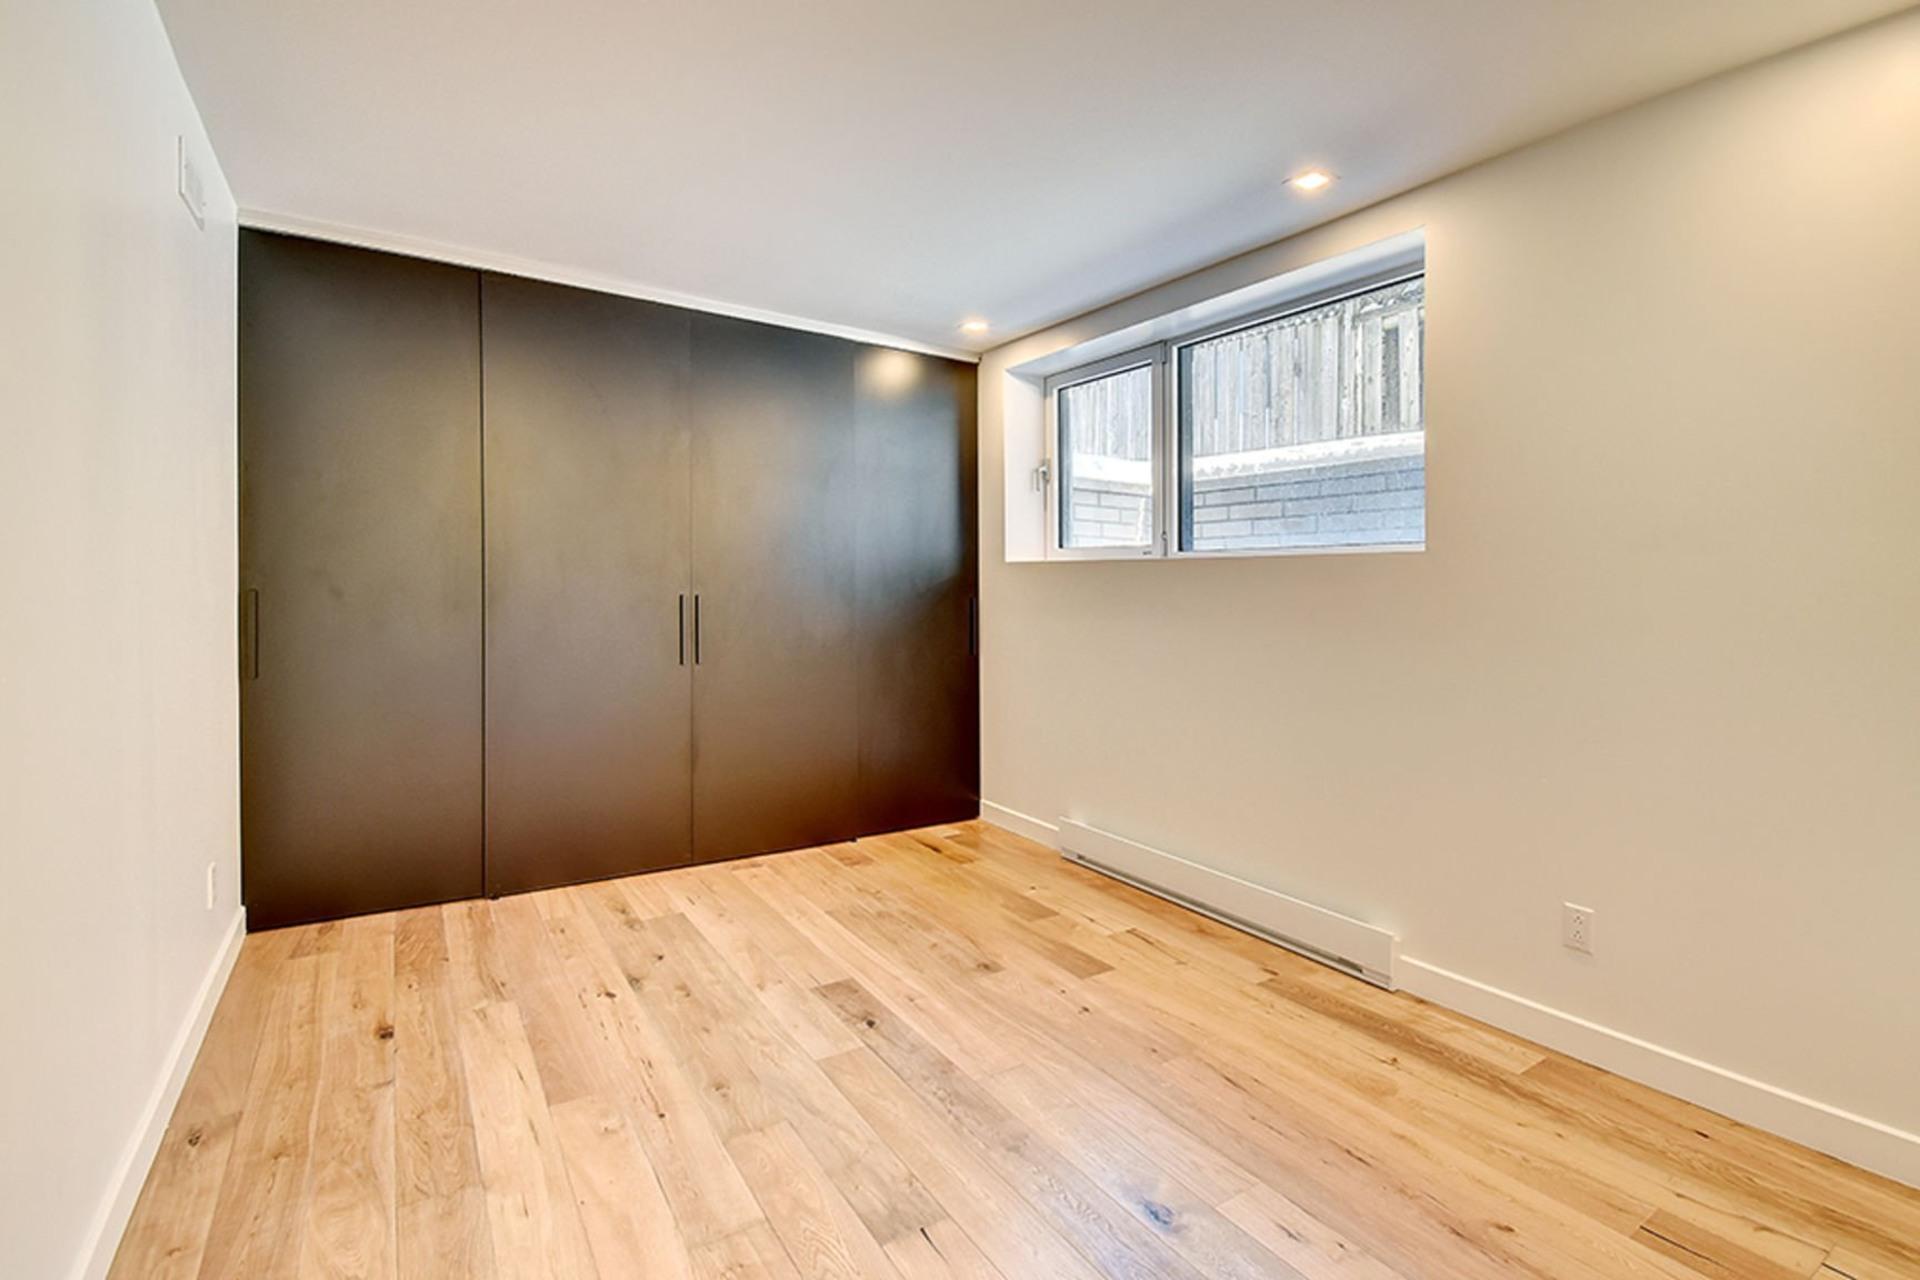 image 16 - Apartment For sale Le Vieux-Longueuil Longueuil  - 9 rooms